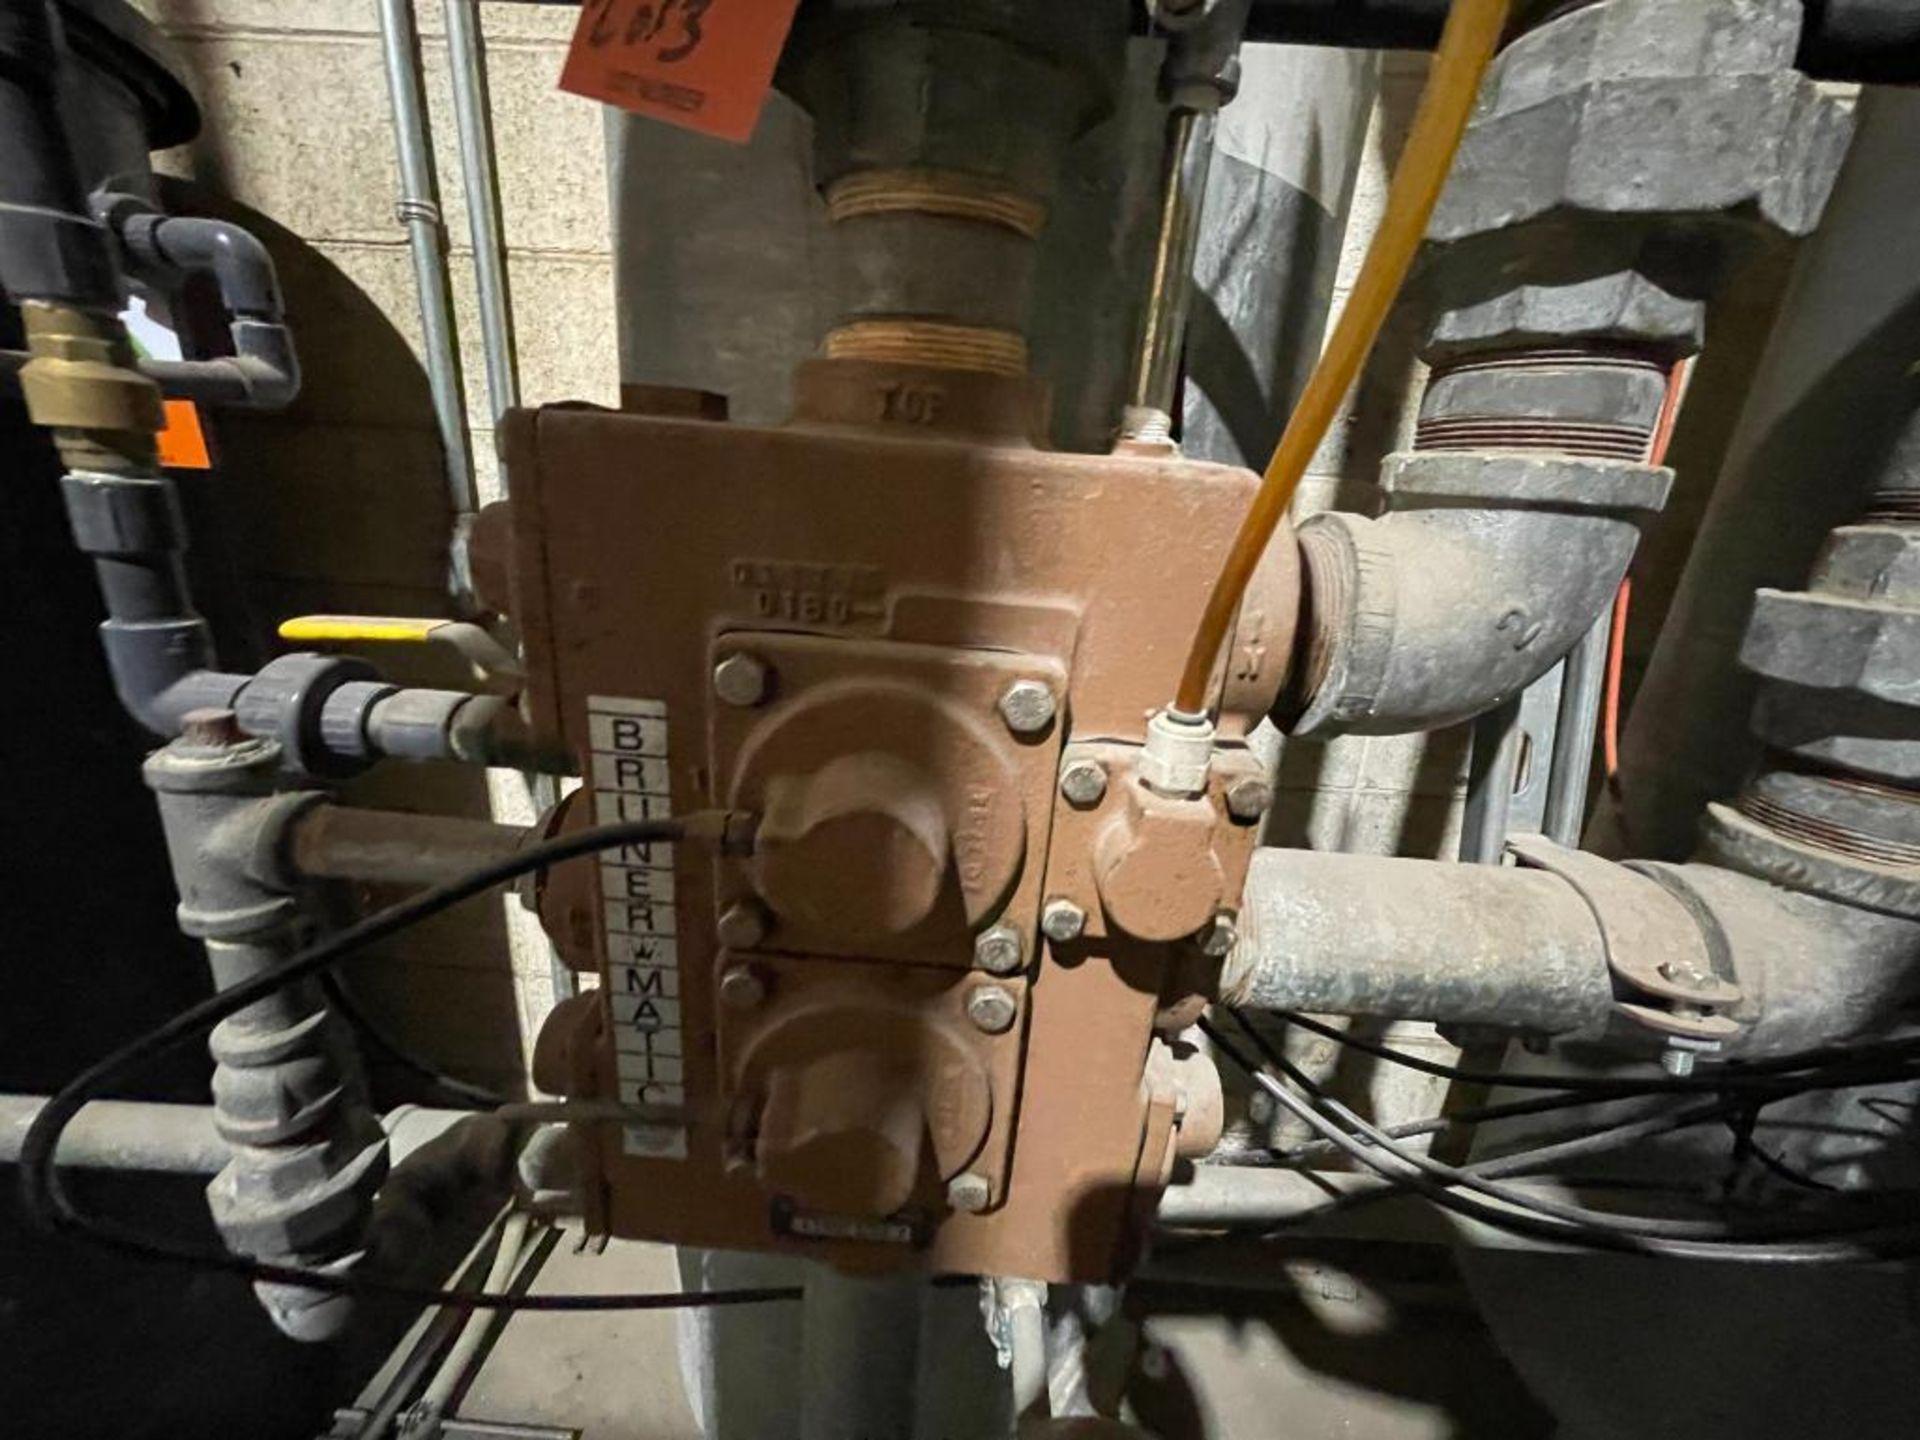 3-tank industrial water softener - Image 7 of 11